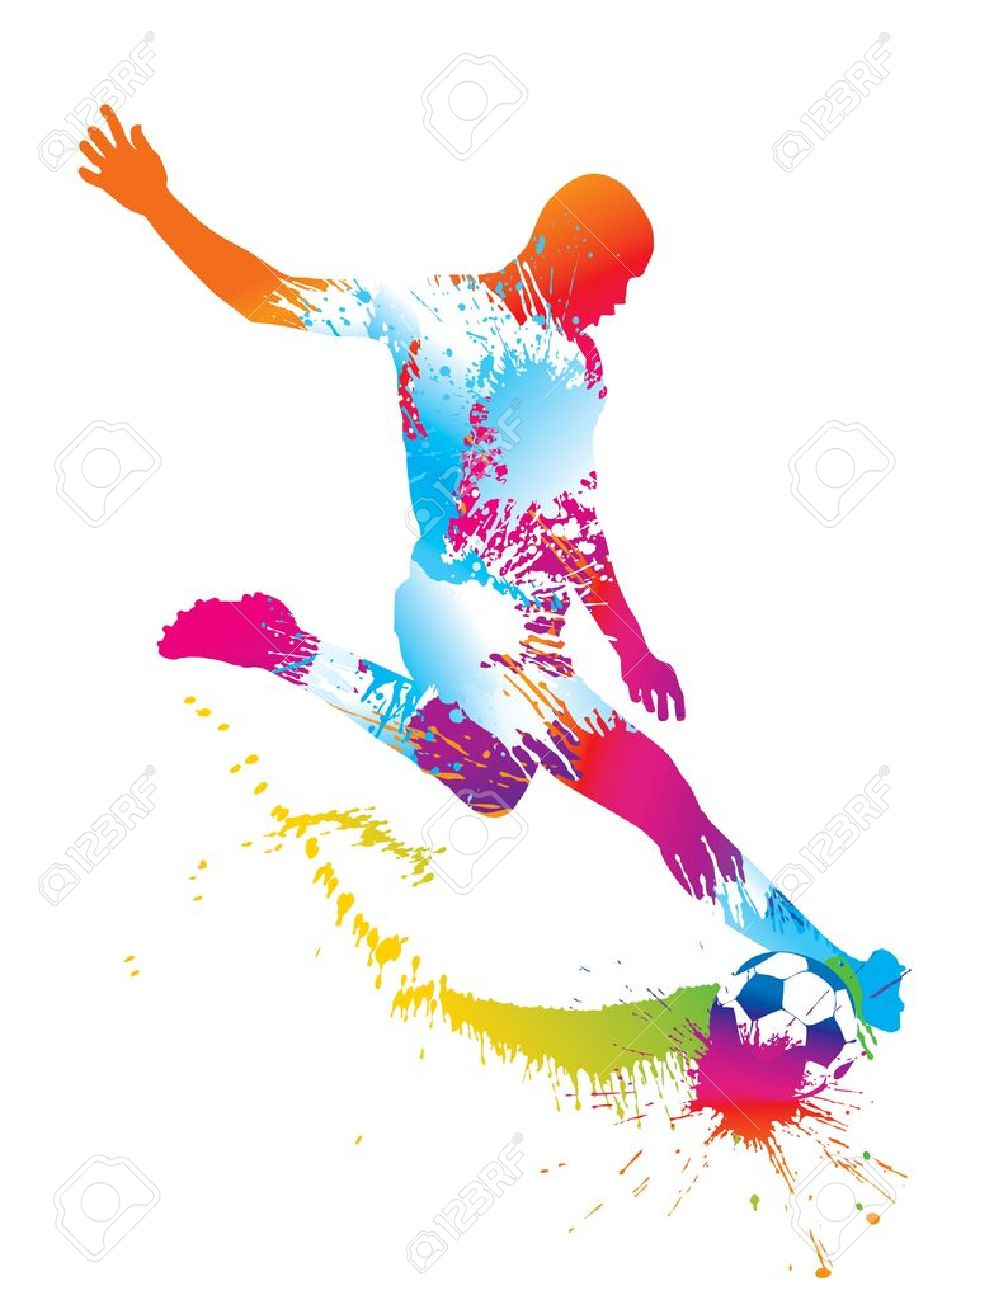 Soccer player kicks the ball. Vector illustration. - 10737724